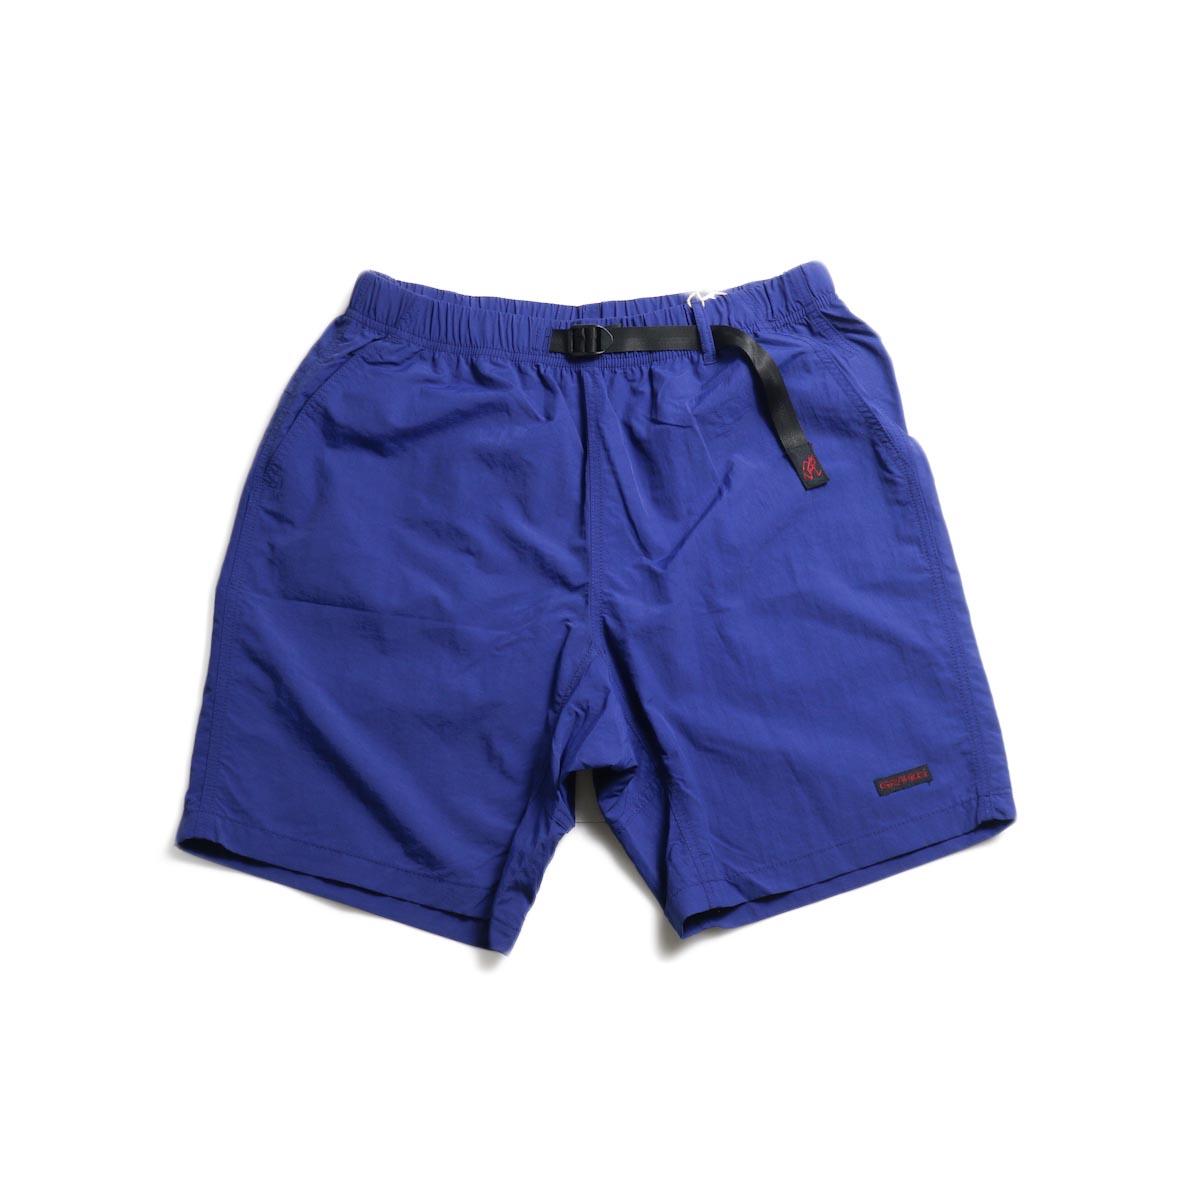 GRAMICCI / Shell Packable Shorts -Navy